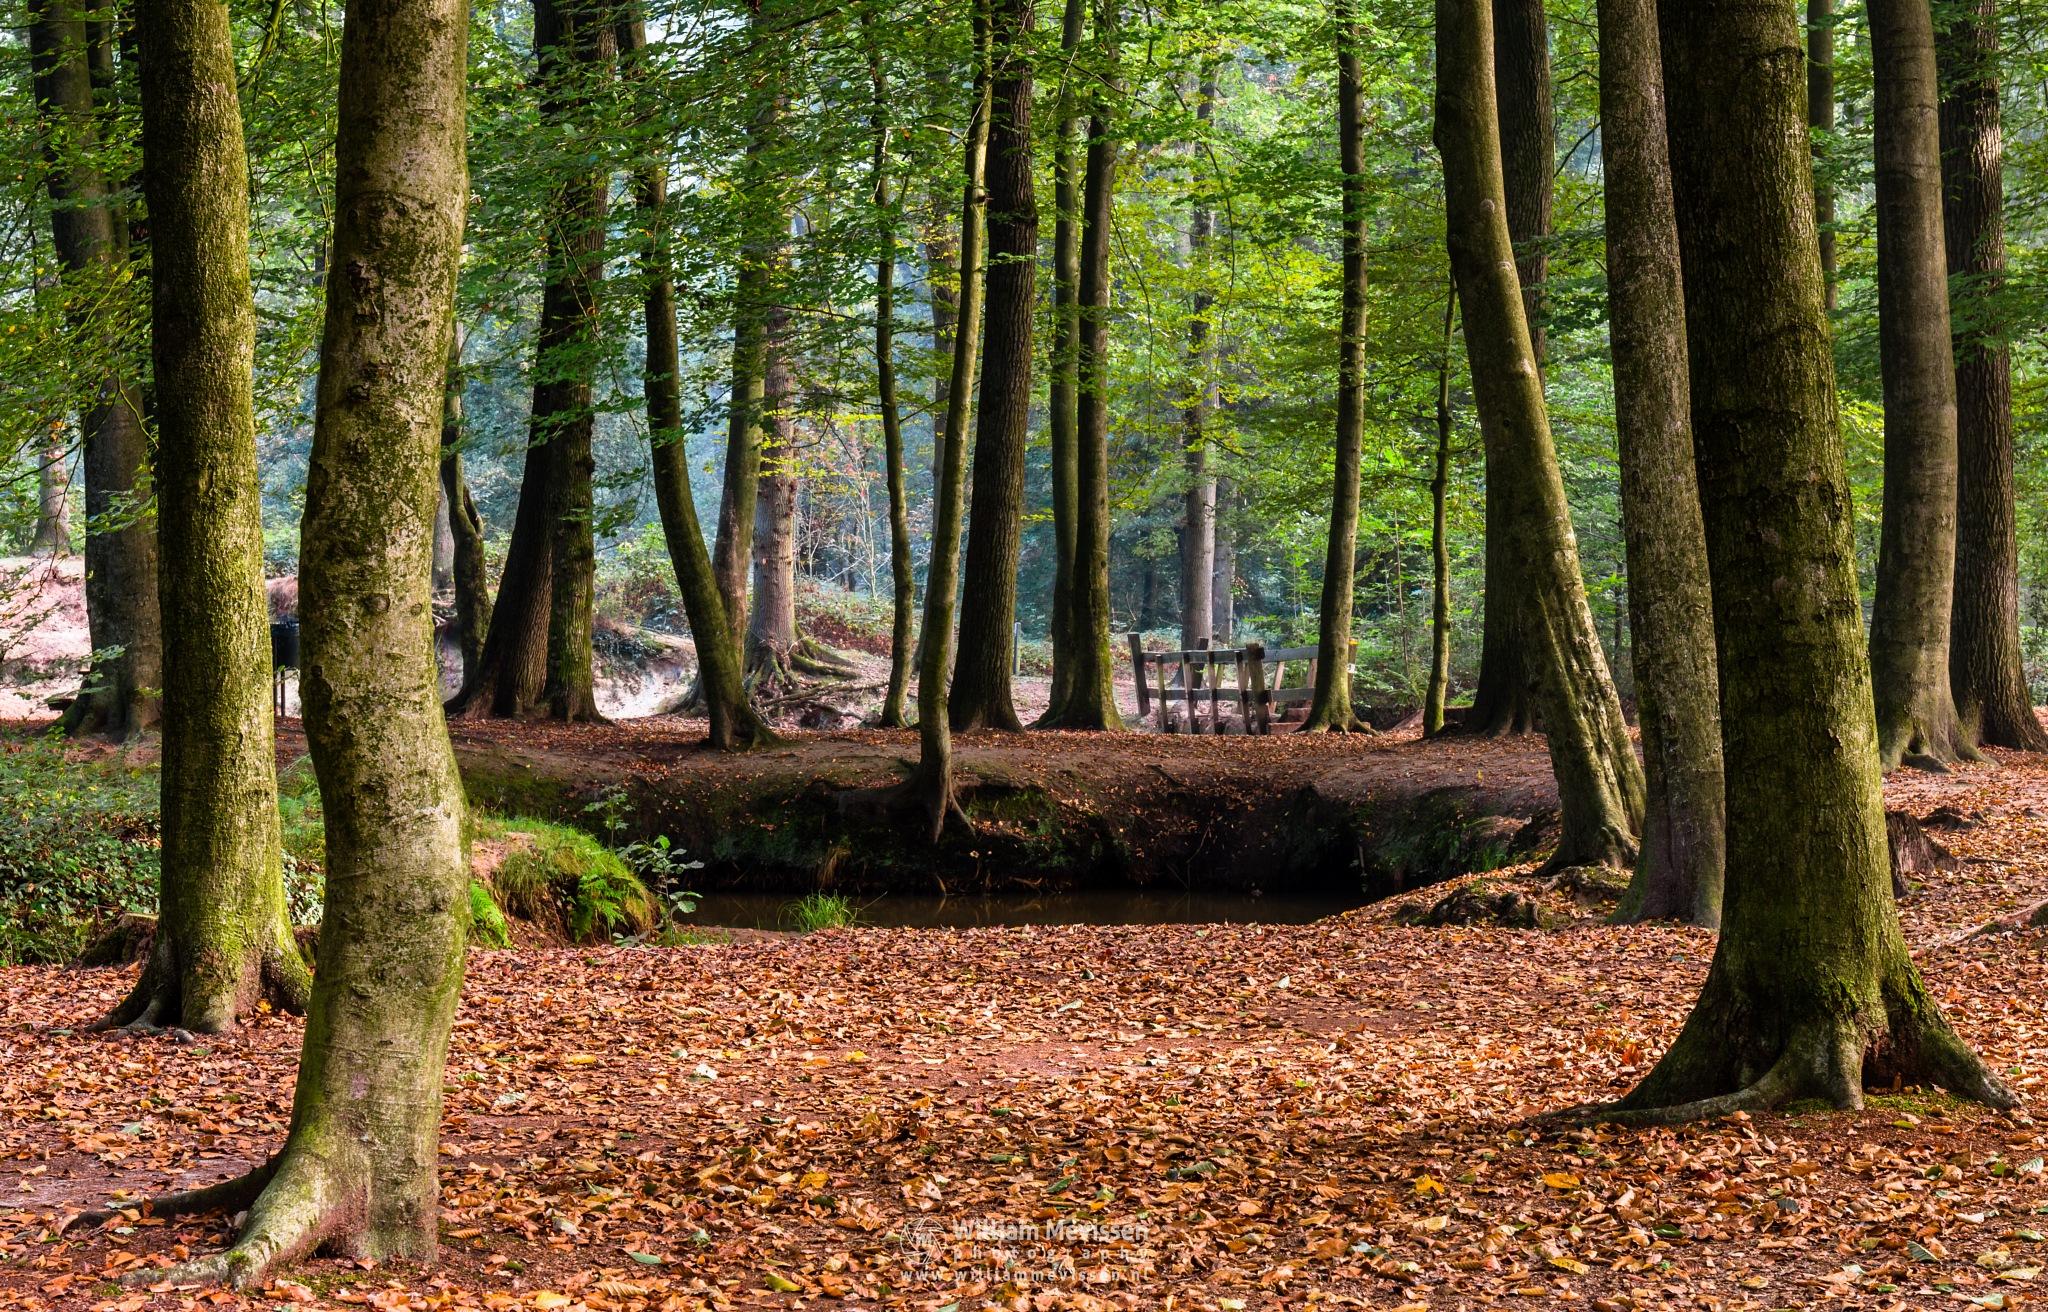 Trees by William Mevissen